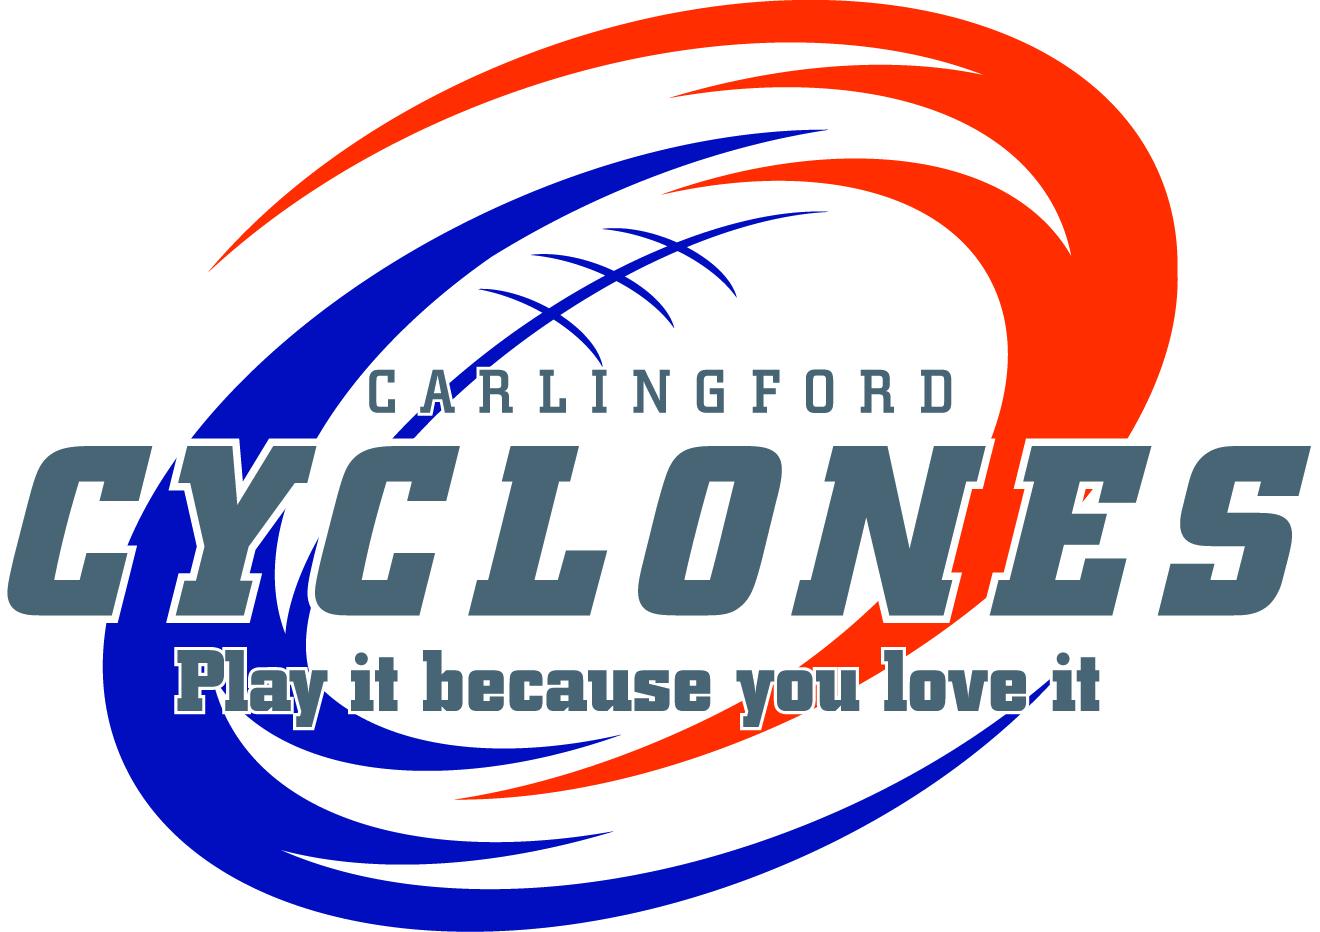 CC slogan